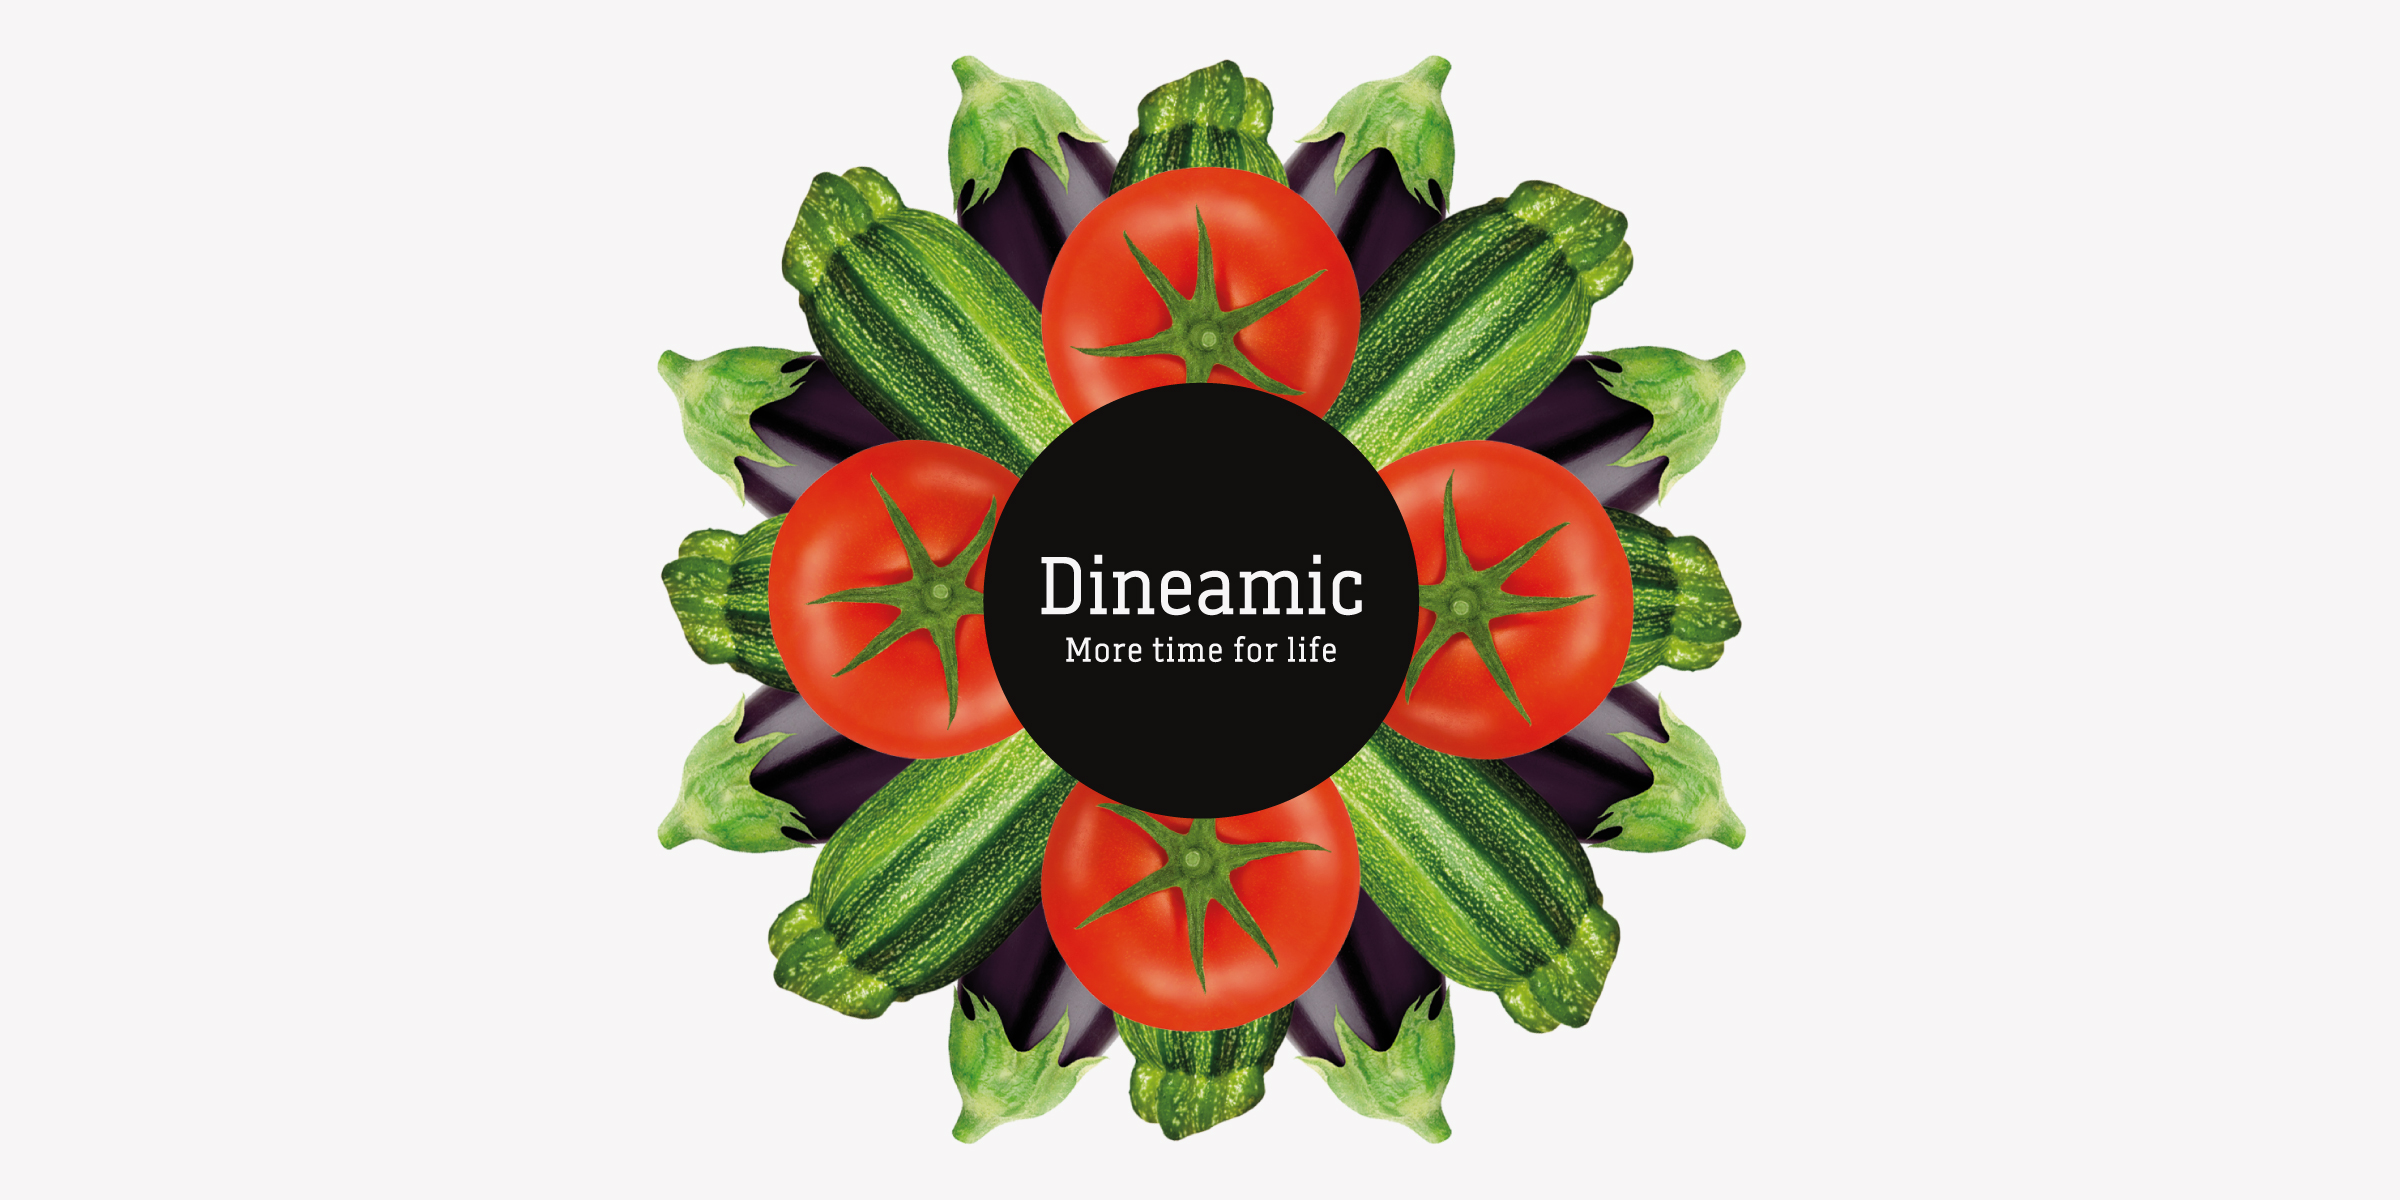 Davidson Branding FMCG Dineamic Packaging Visual Language Kaleidoscope Tomato Zucchini Banner